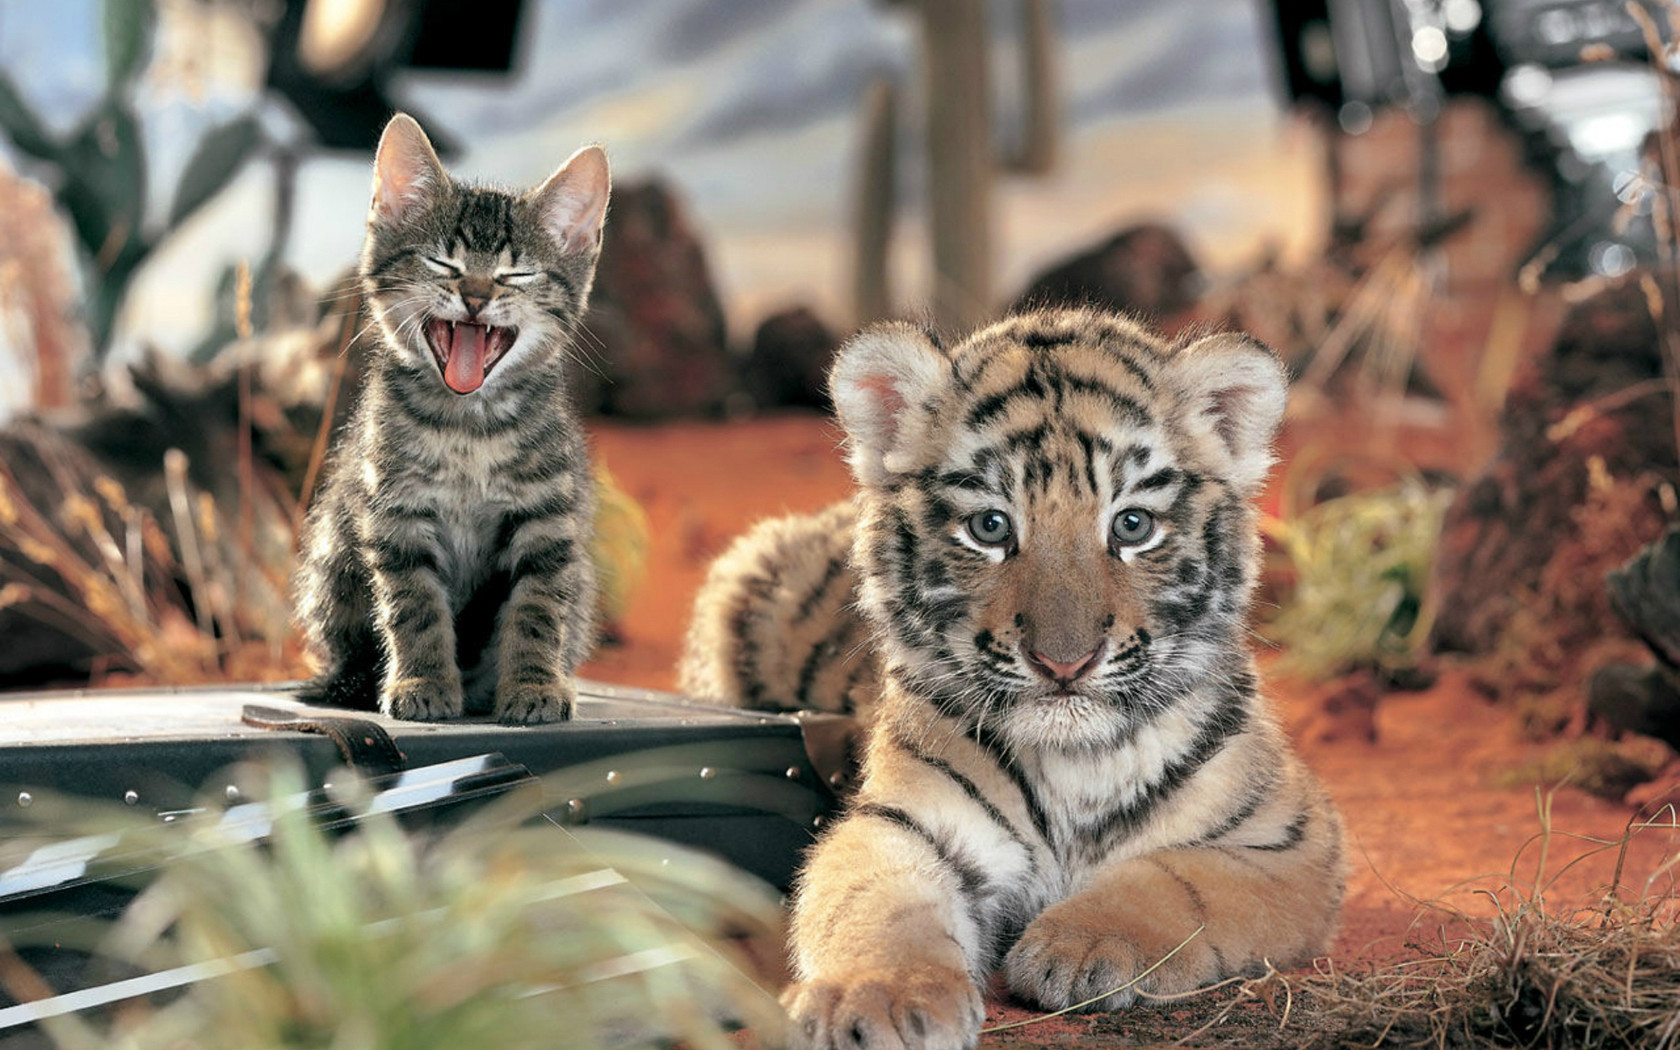 Картинки тигрят с надписью